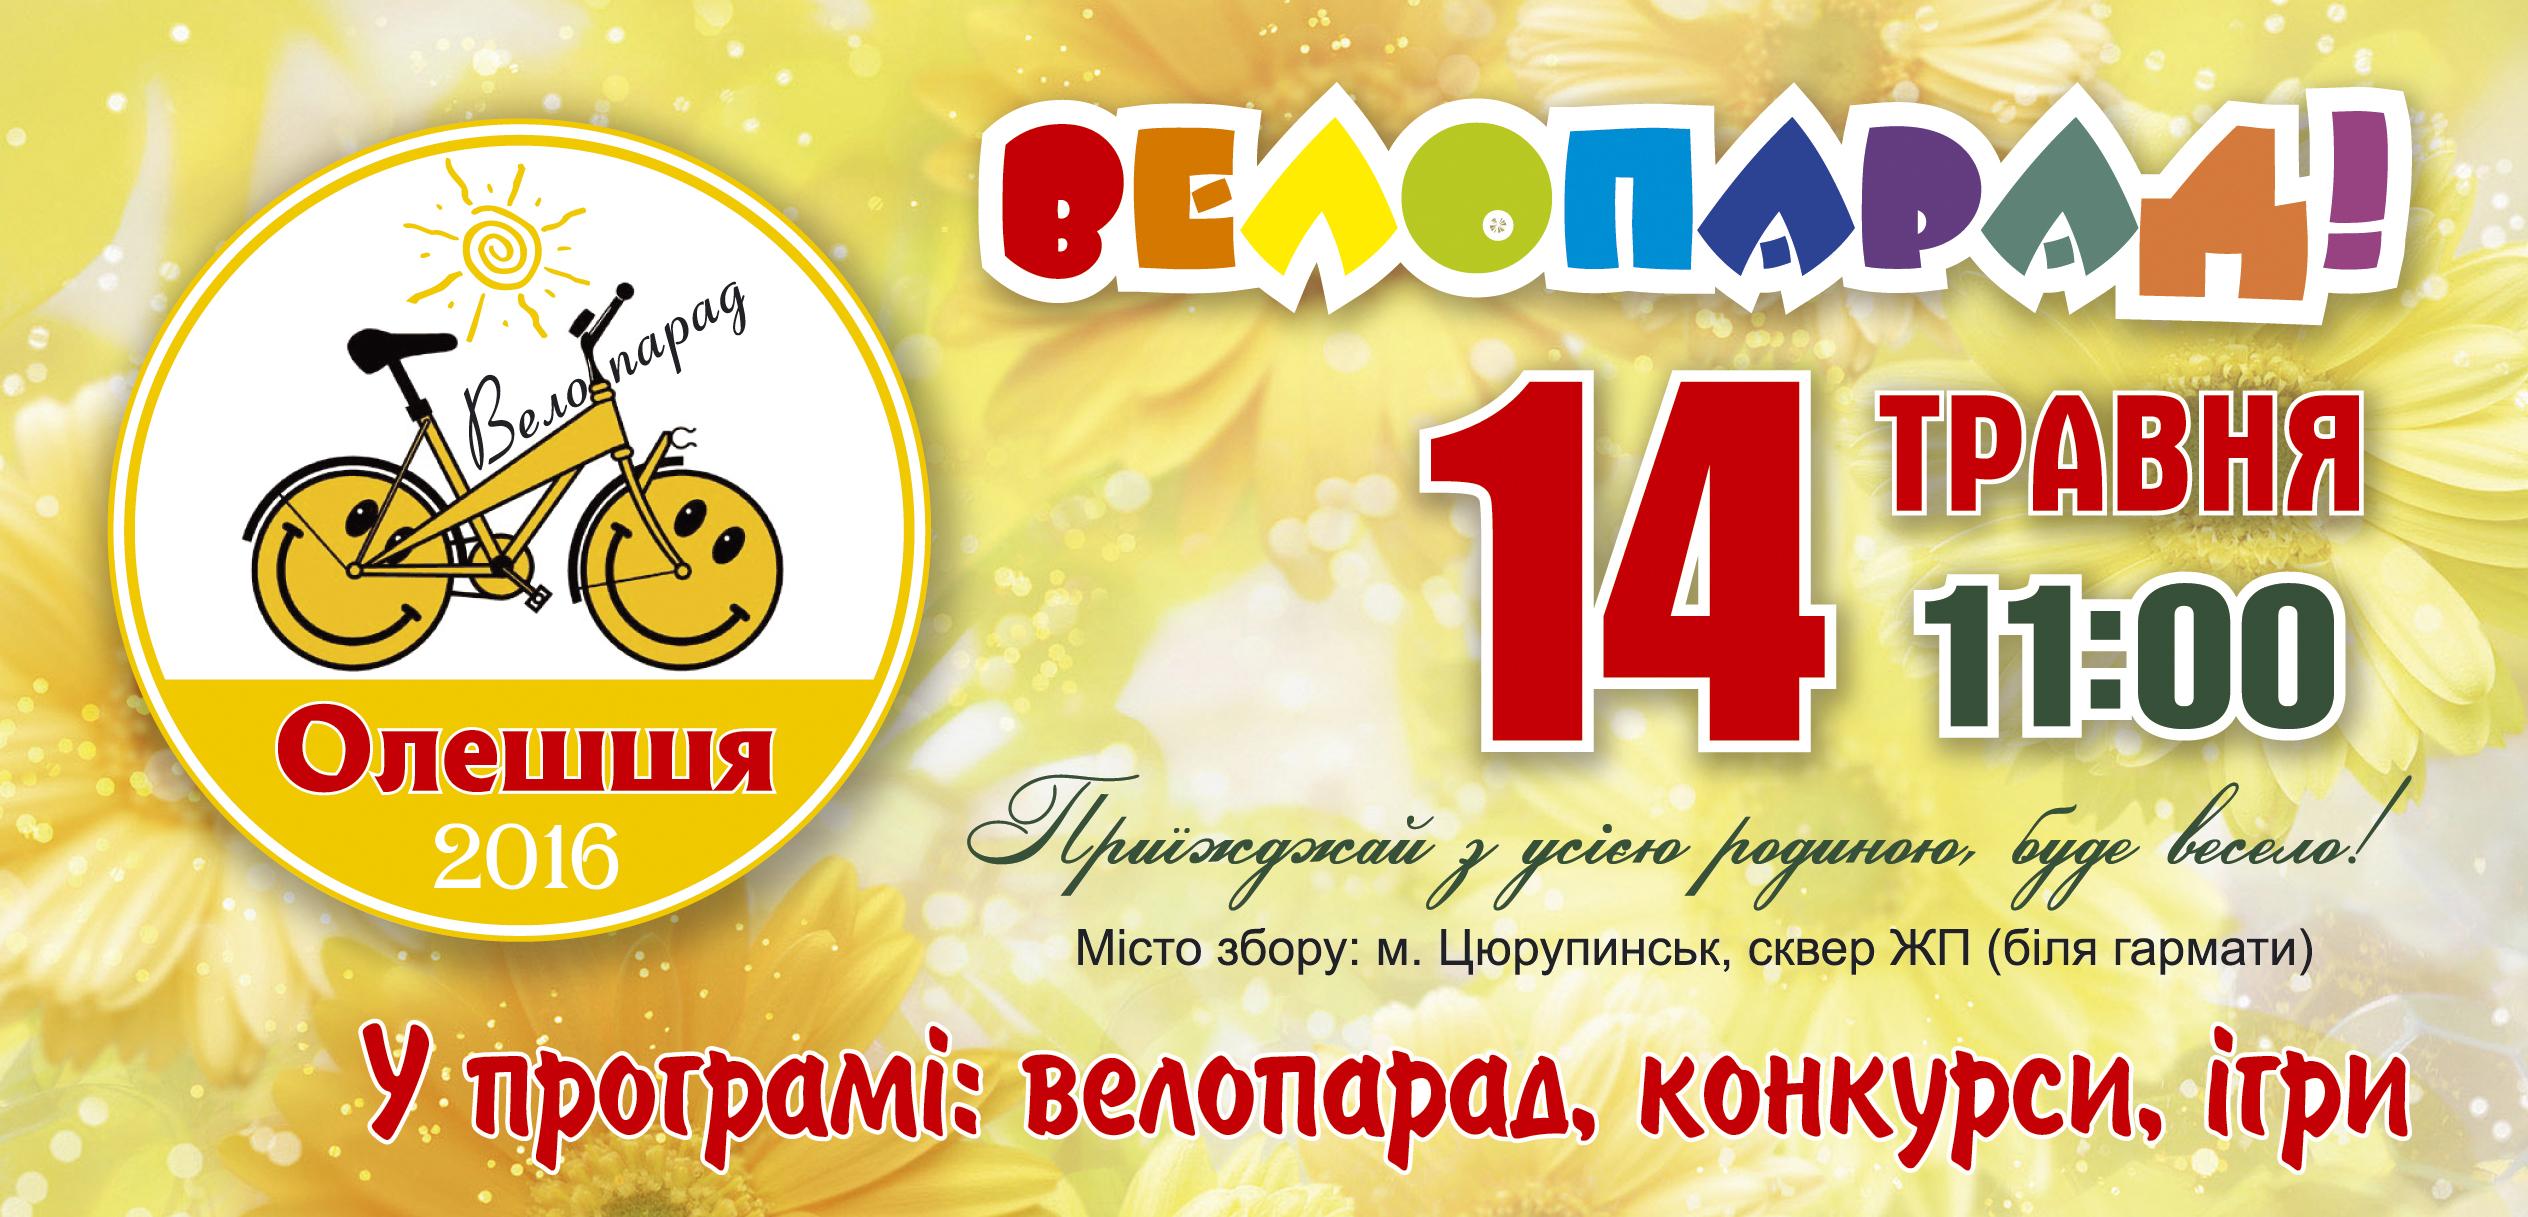 http://s2.uploads.ru/yQJT1.jpg